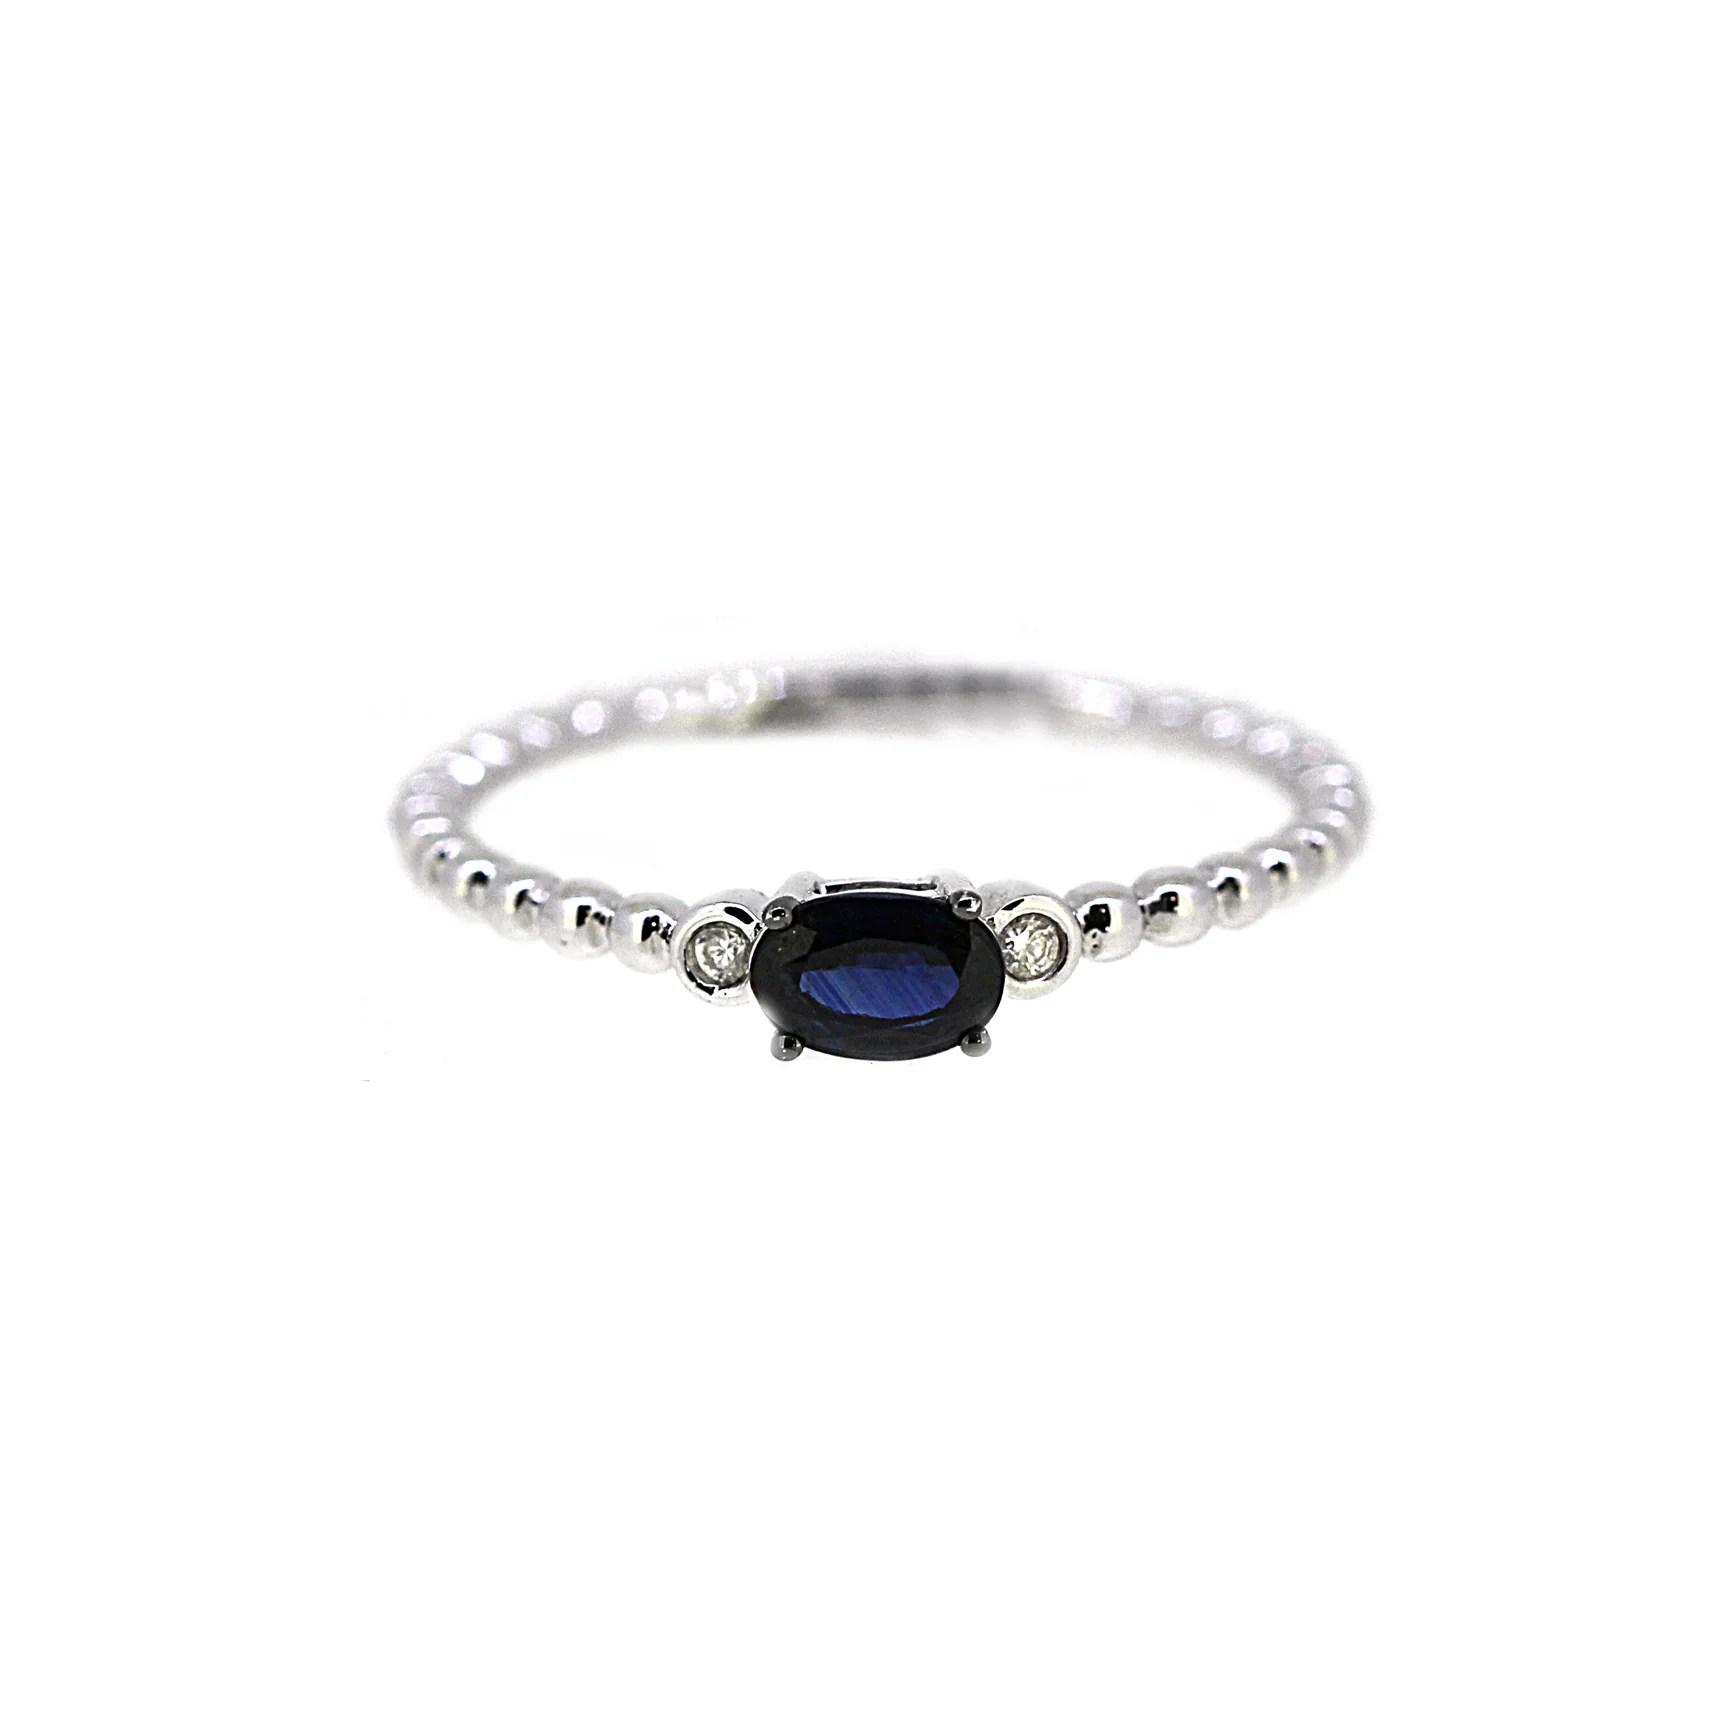 Glomorous Mini Blue Sapphire Ring Mini Blue Sapphire Rose G Melissa Harris Jewellery Blue Sapphire Ring India Blue Sapphire Ring Walmart wedding rings Blue Sapphire Ring